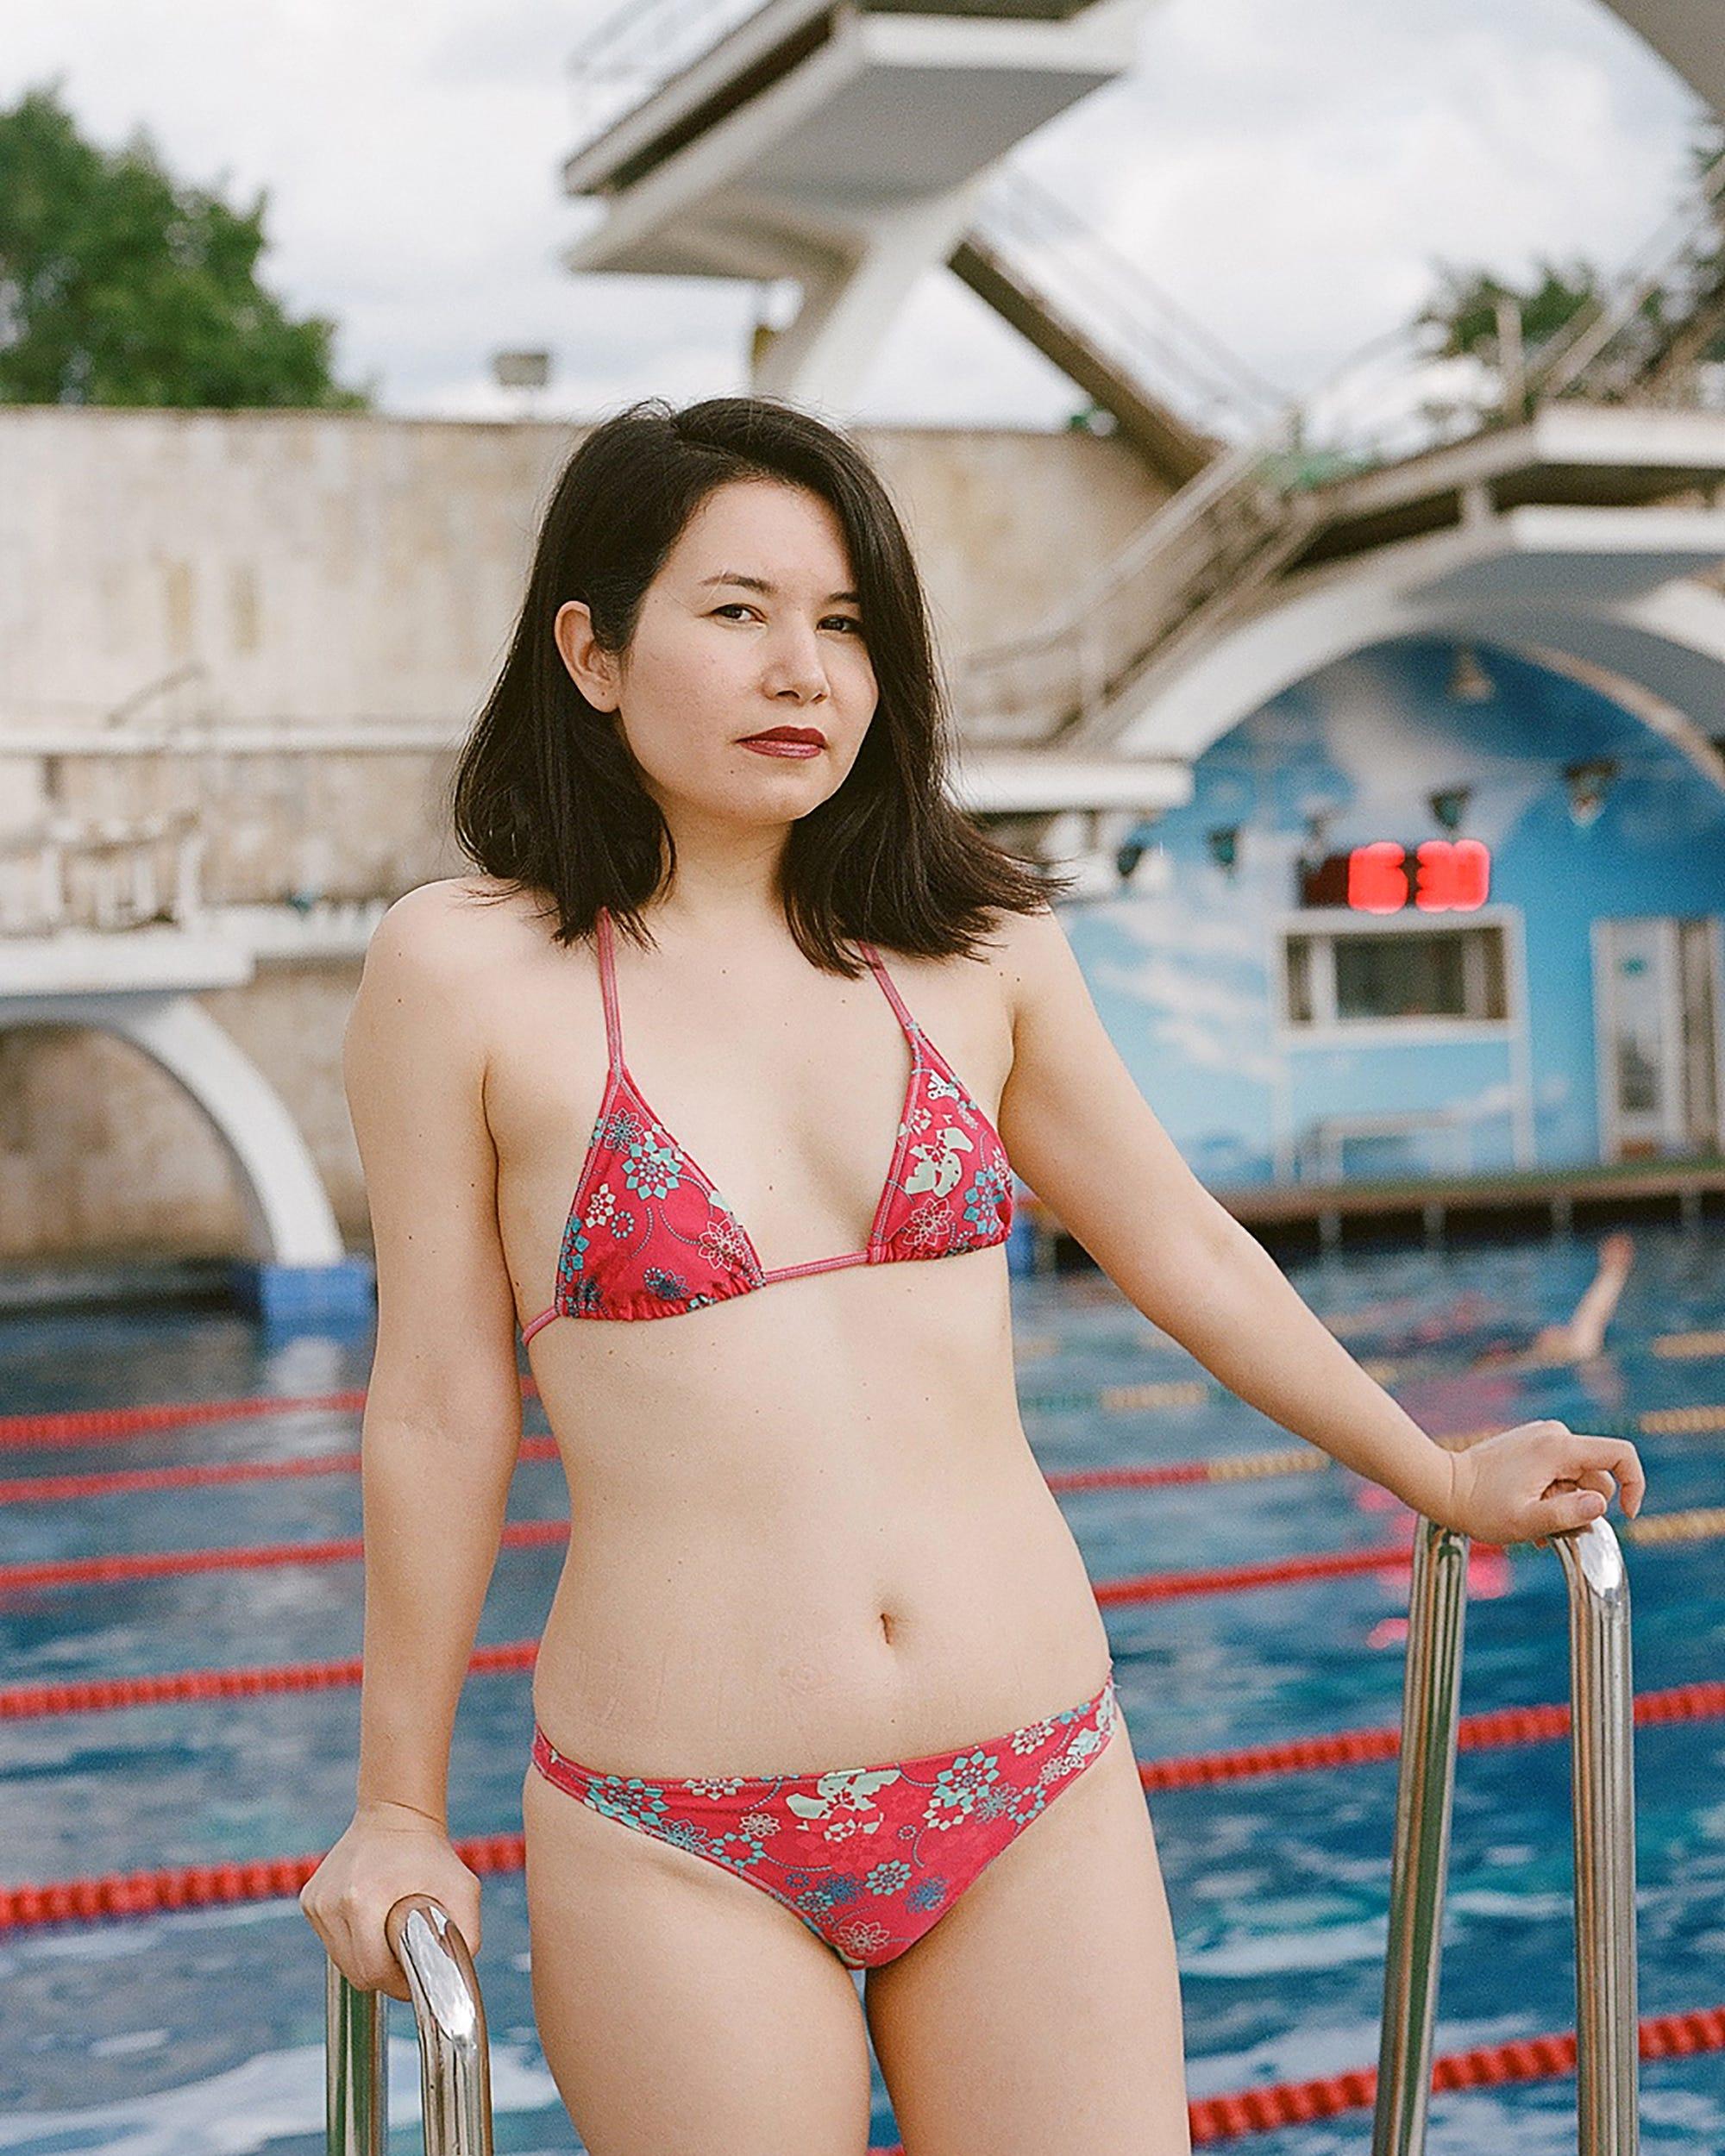 hassliche frau bikini